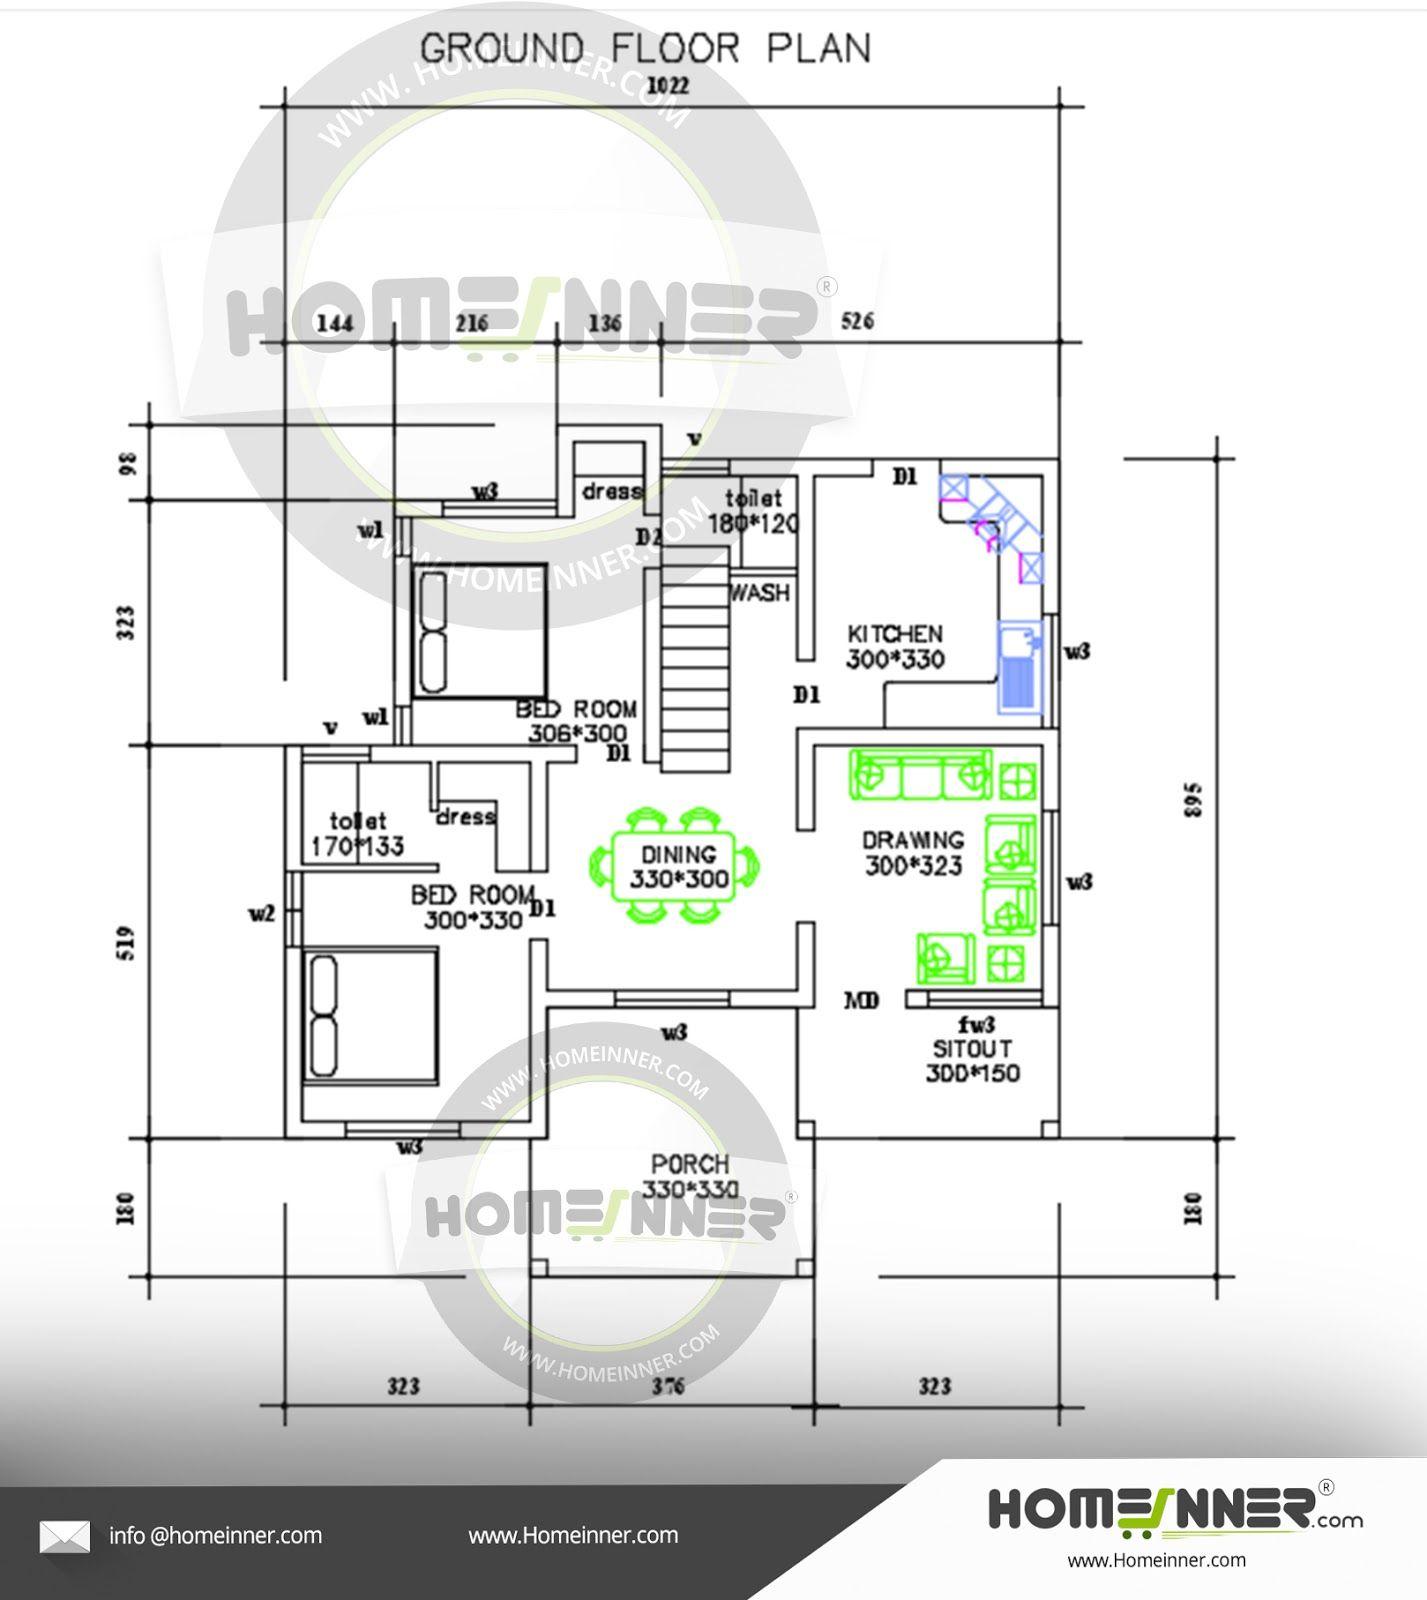 Best Home Design Magazine Free House Plans House Floor Plans House Plans